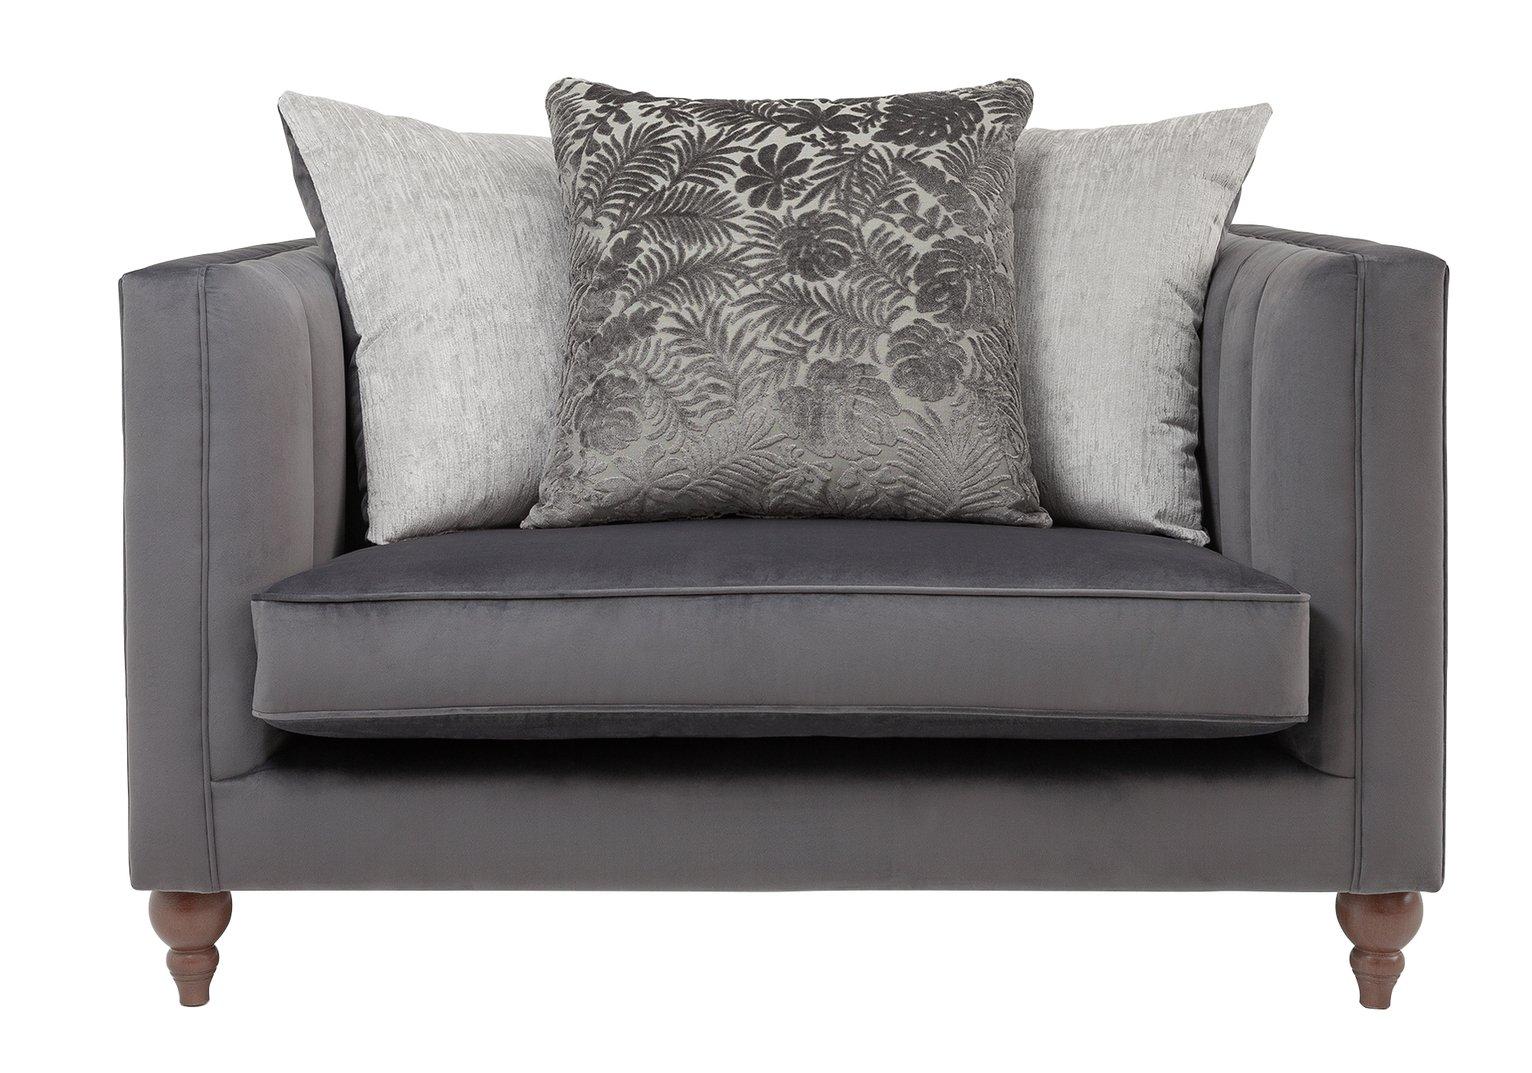 Argos Home Bardot Velvet Cuddle Chair - Charcoal